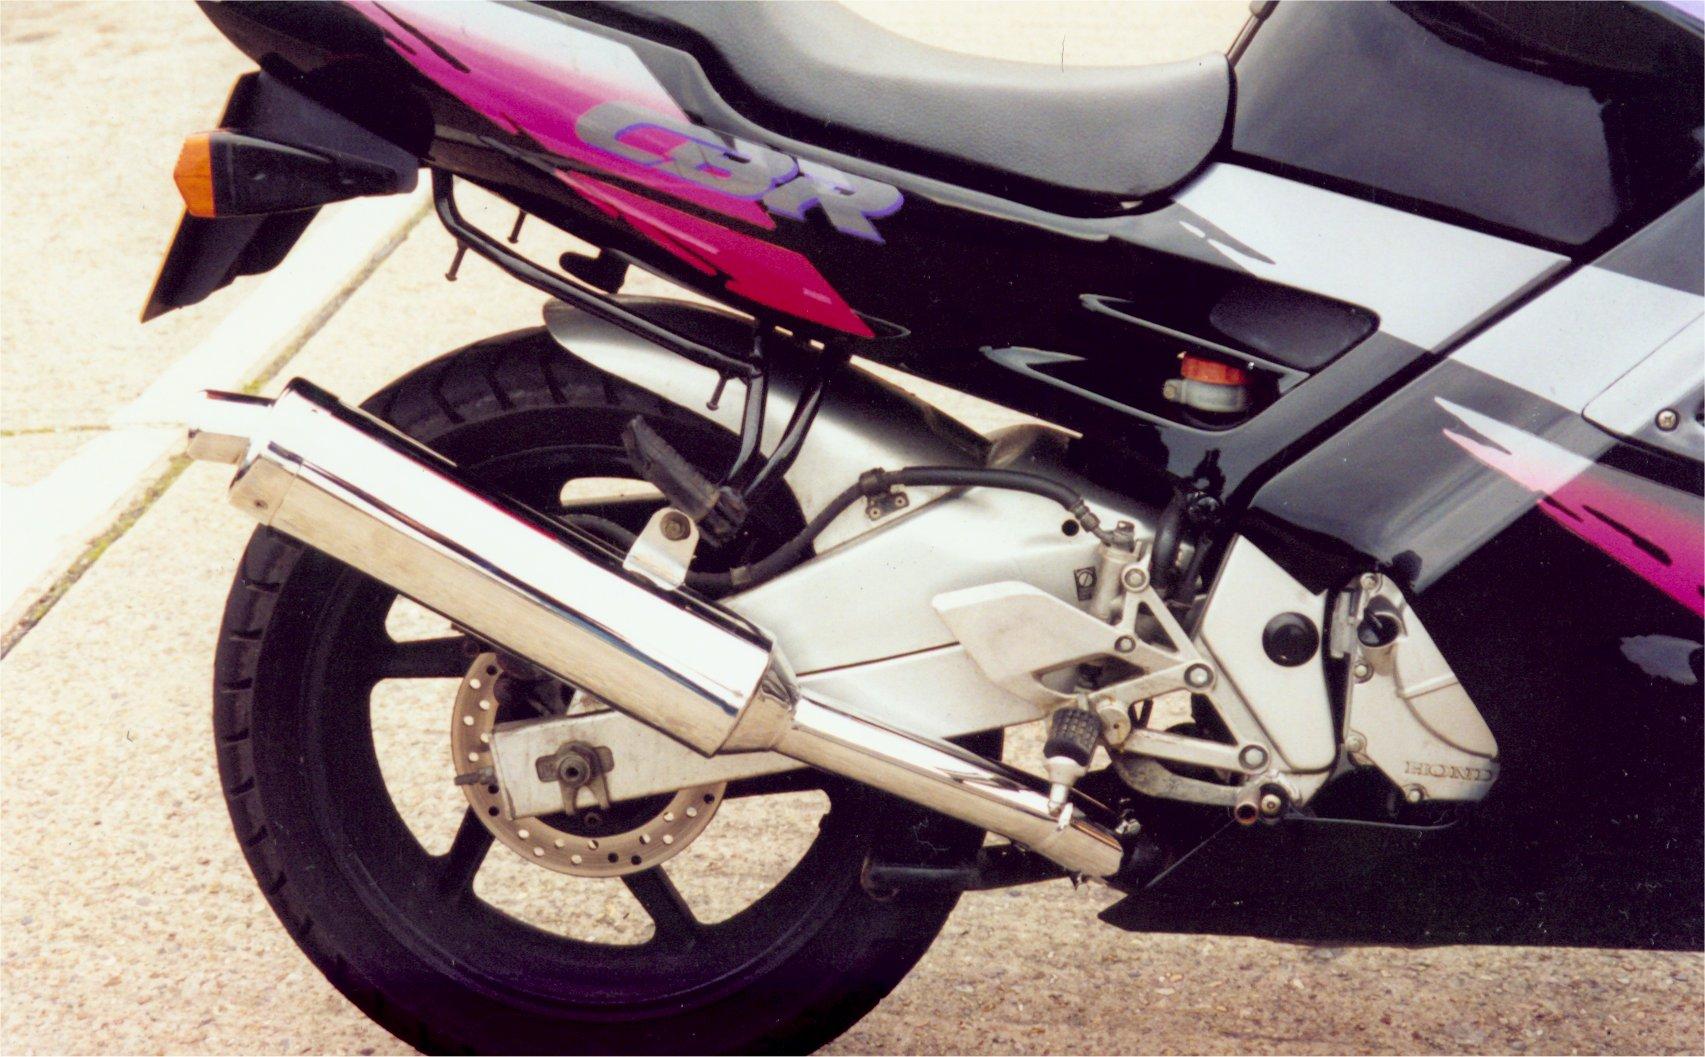 Honda Cbr600f Fmfr Exhaust Sustem Cbr600f Exhaust Honda Exhaust